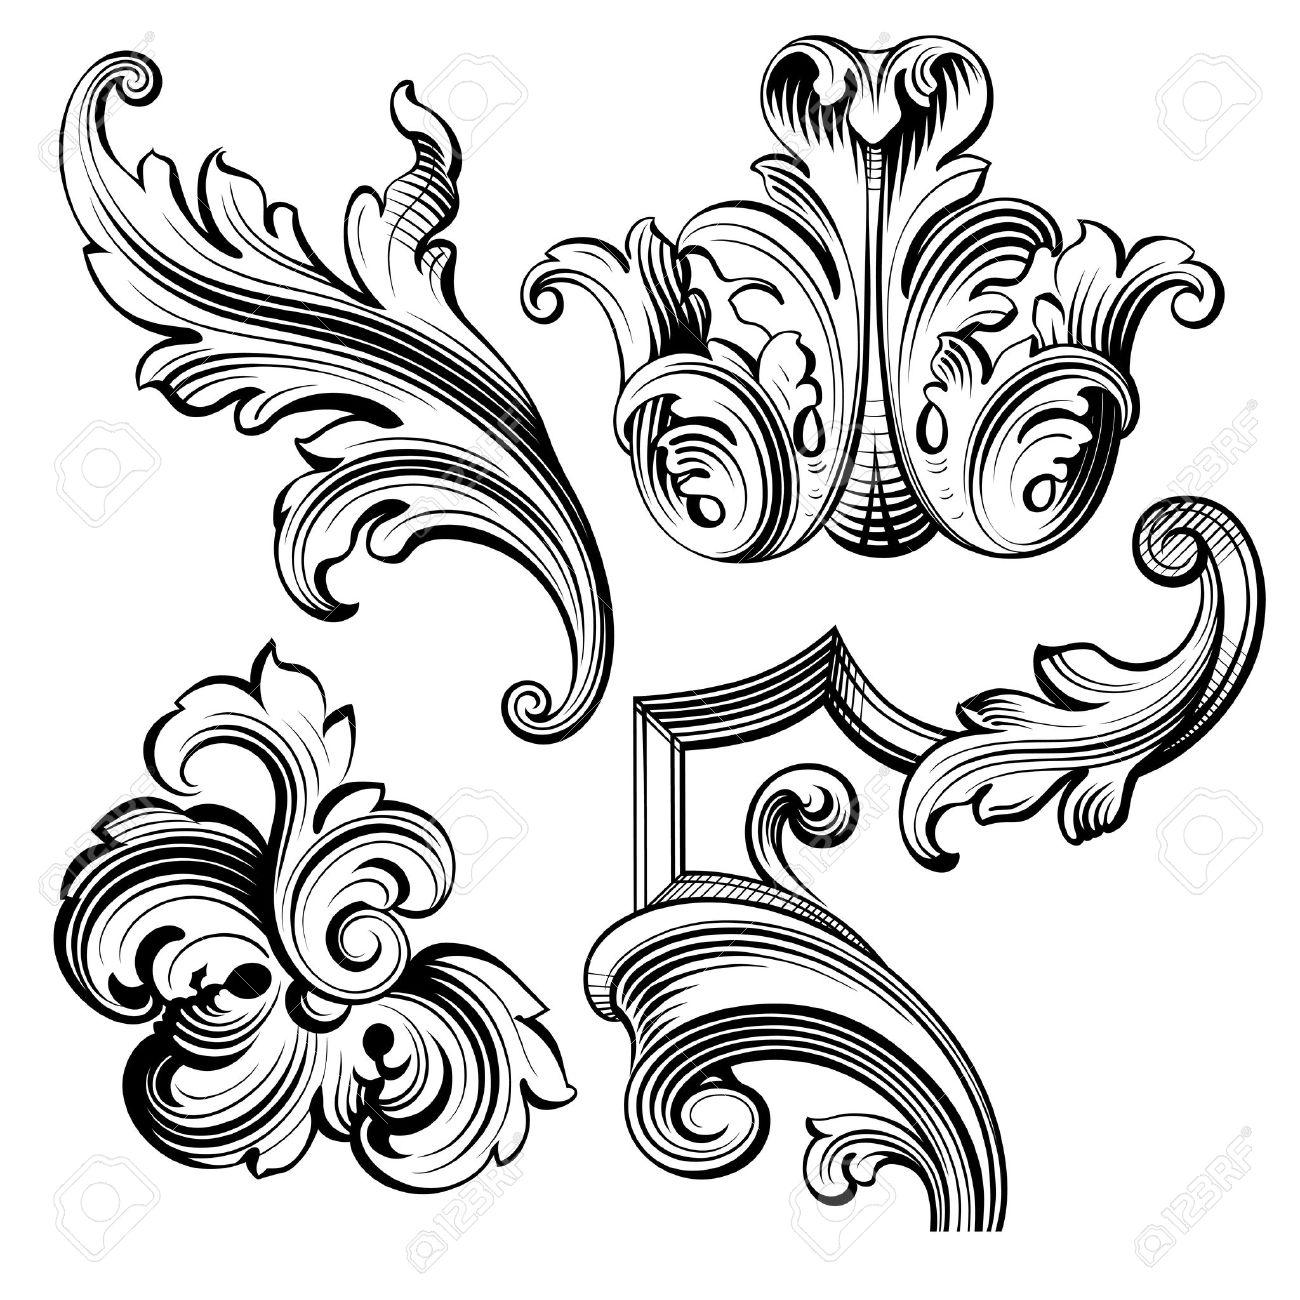 Vintage Baroque Victorian frame border monogram floral ornament leaf scroll engraved retro flower pattern decorative design tattoo black and white filigree calligraphic vector heraldic shield swirl - 58332291